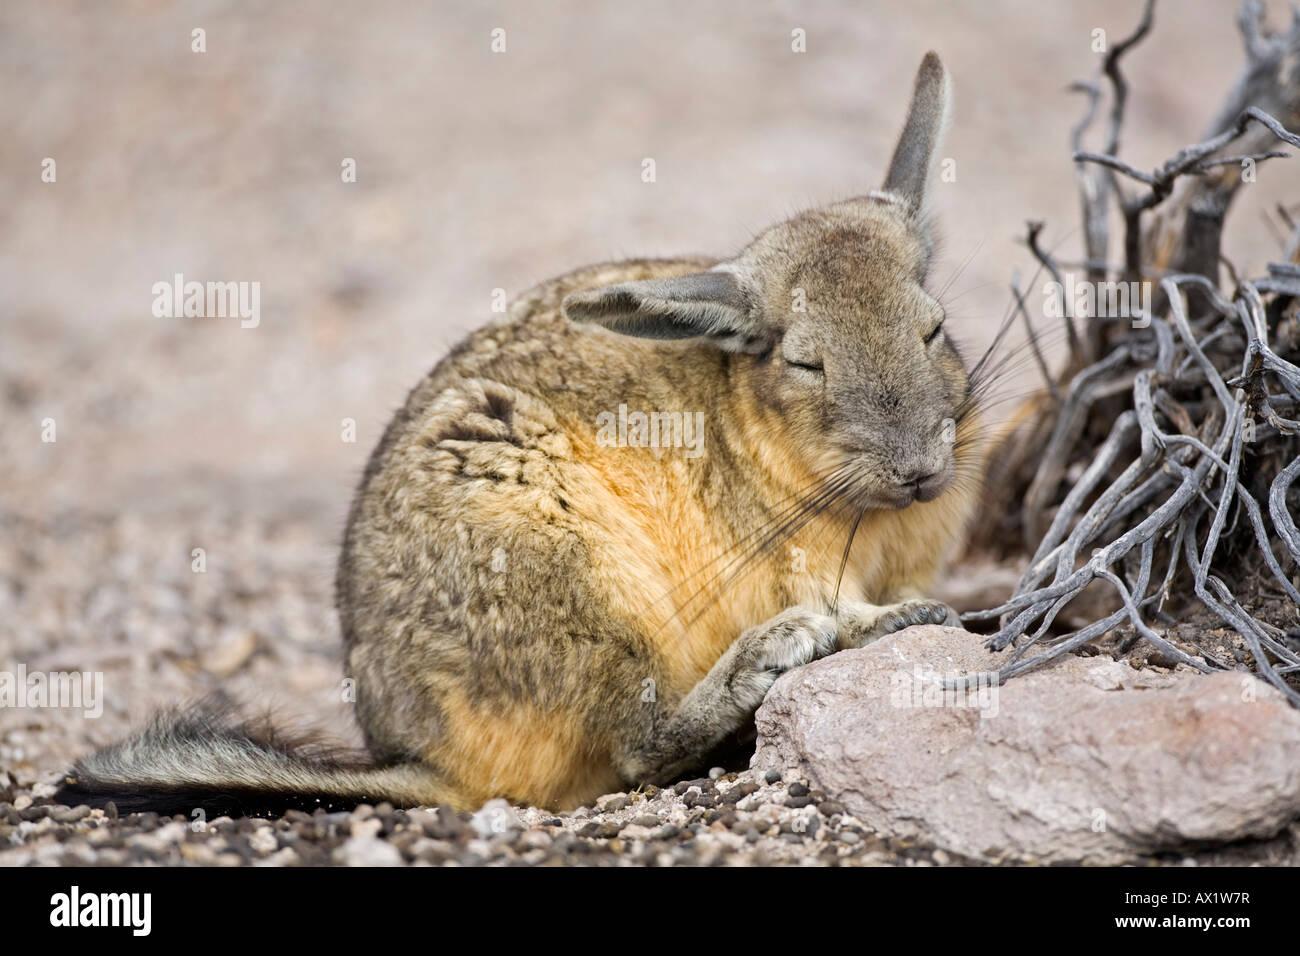 Viscacha (Lagidium) relatives from the Chinchillas in the rocks, Conaf station Las Cuevas, national park Lauca, - Stock Image